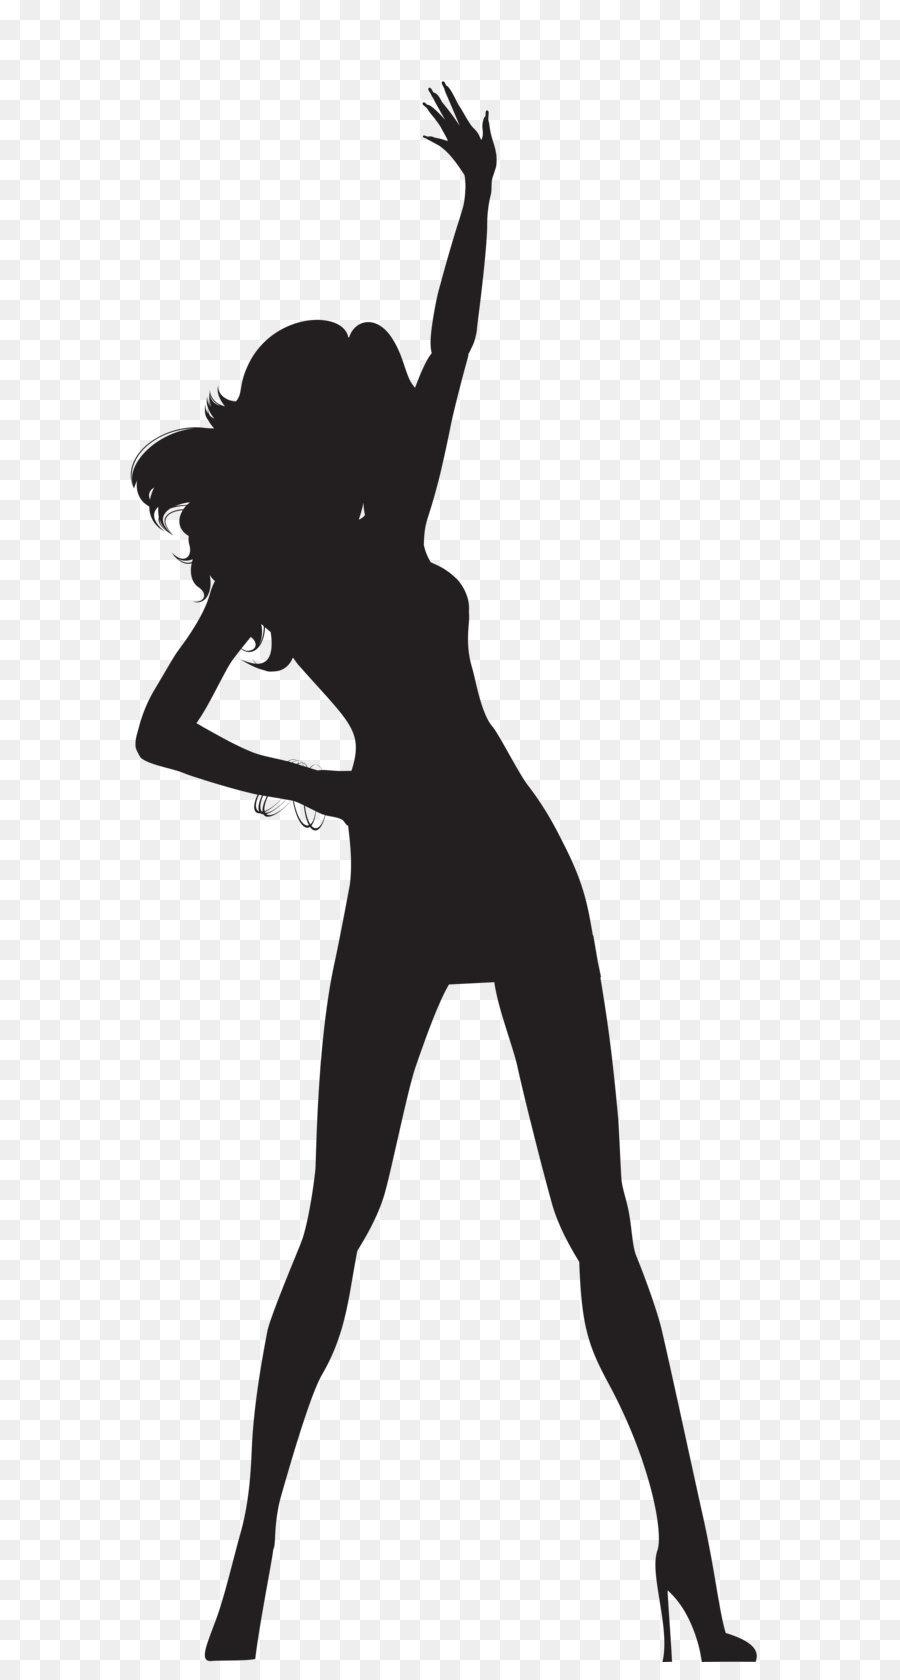 Woman Silhouette Clip art.